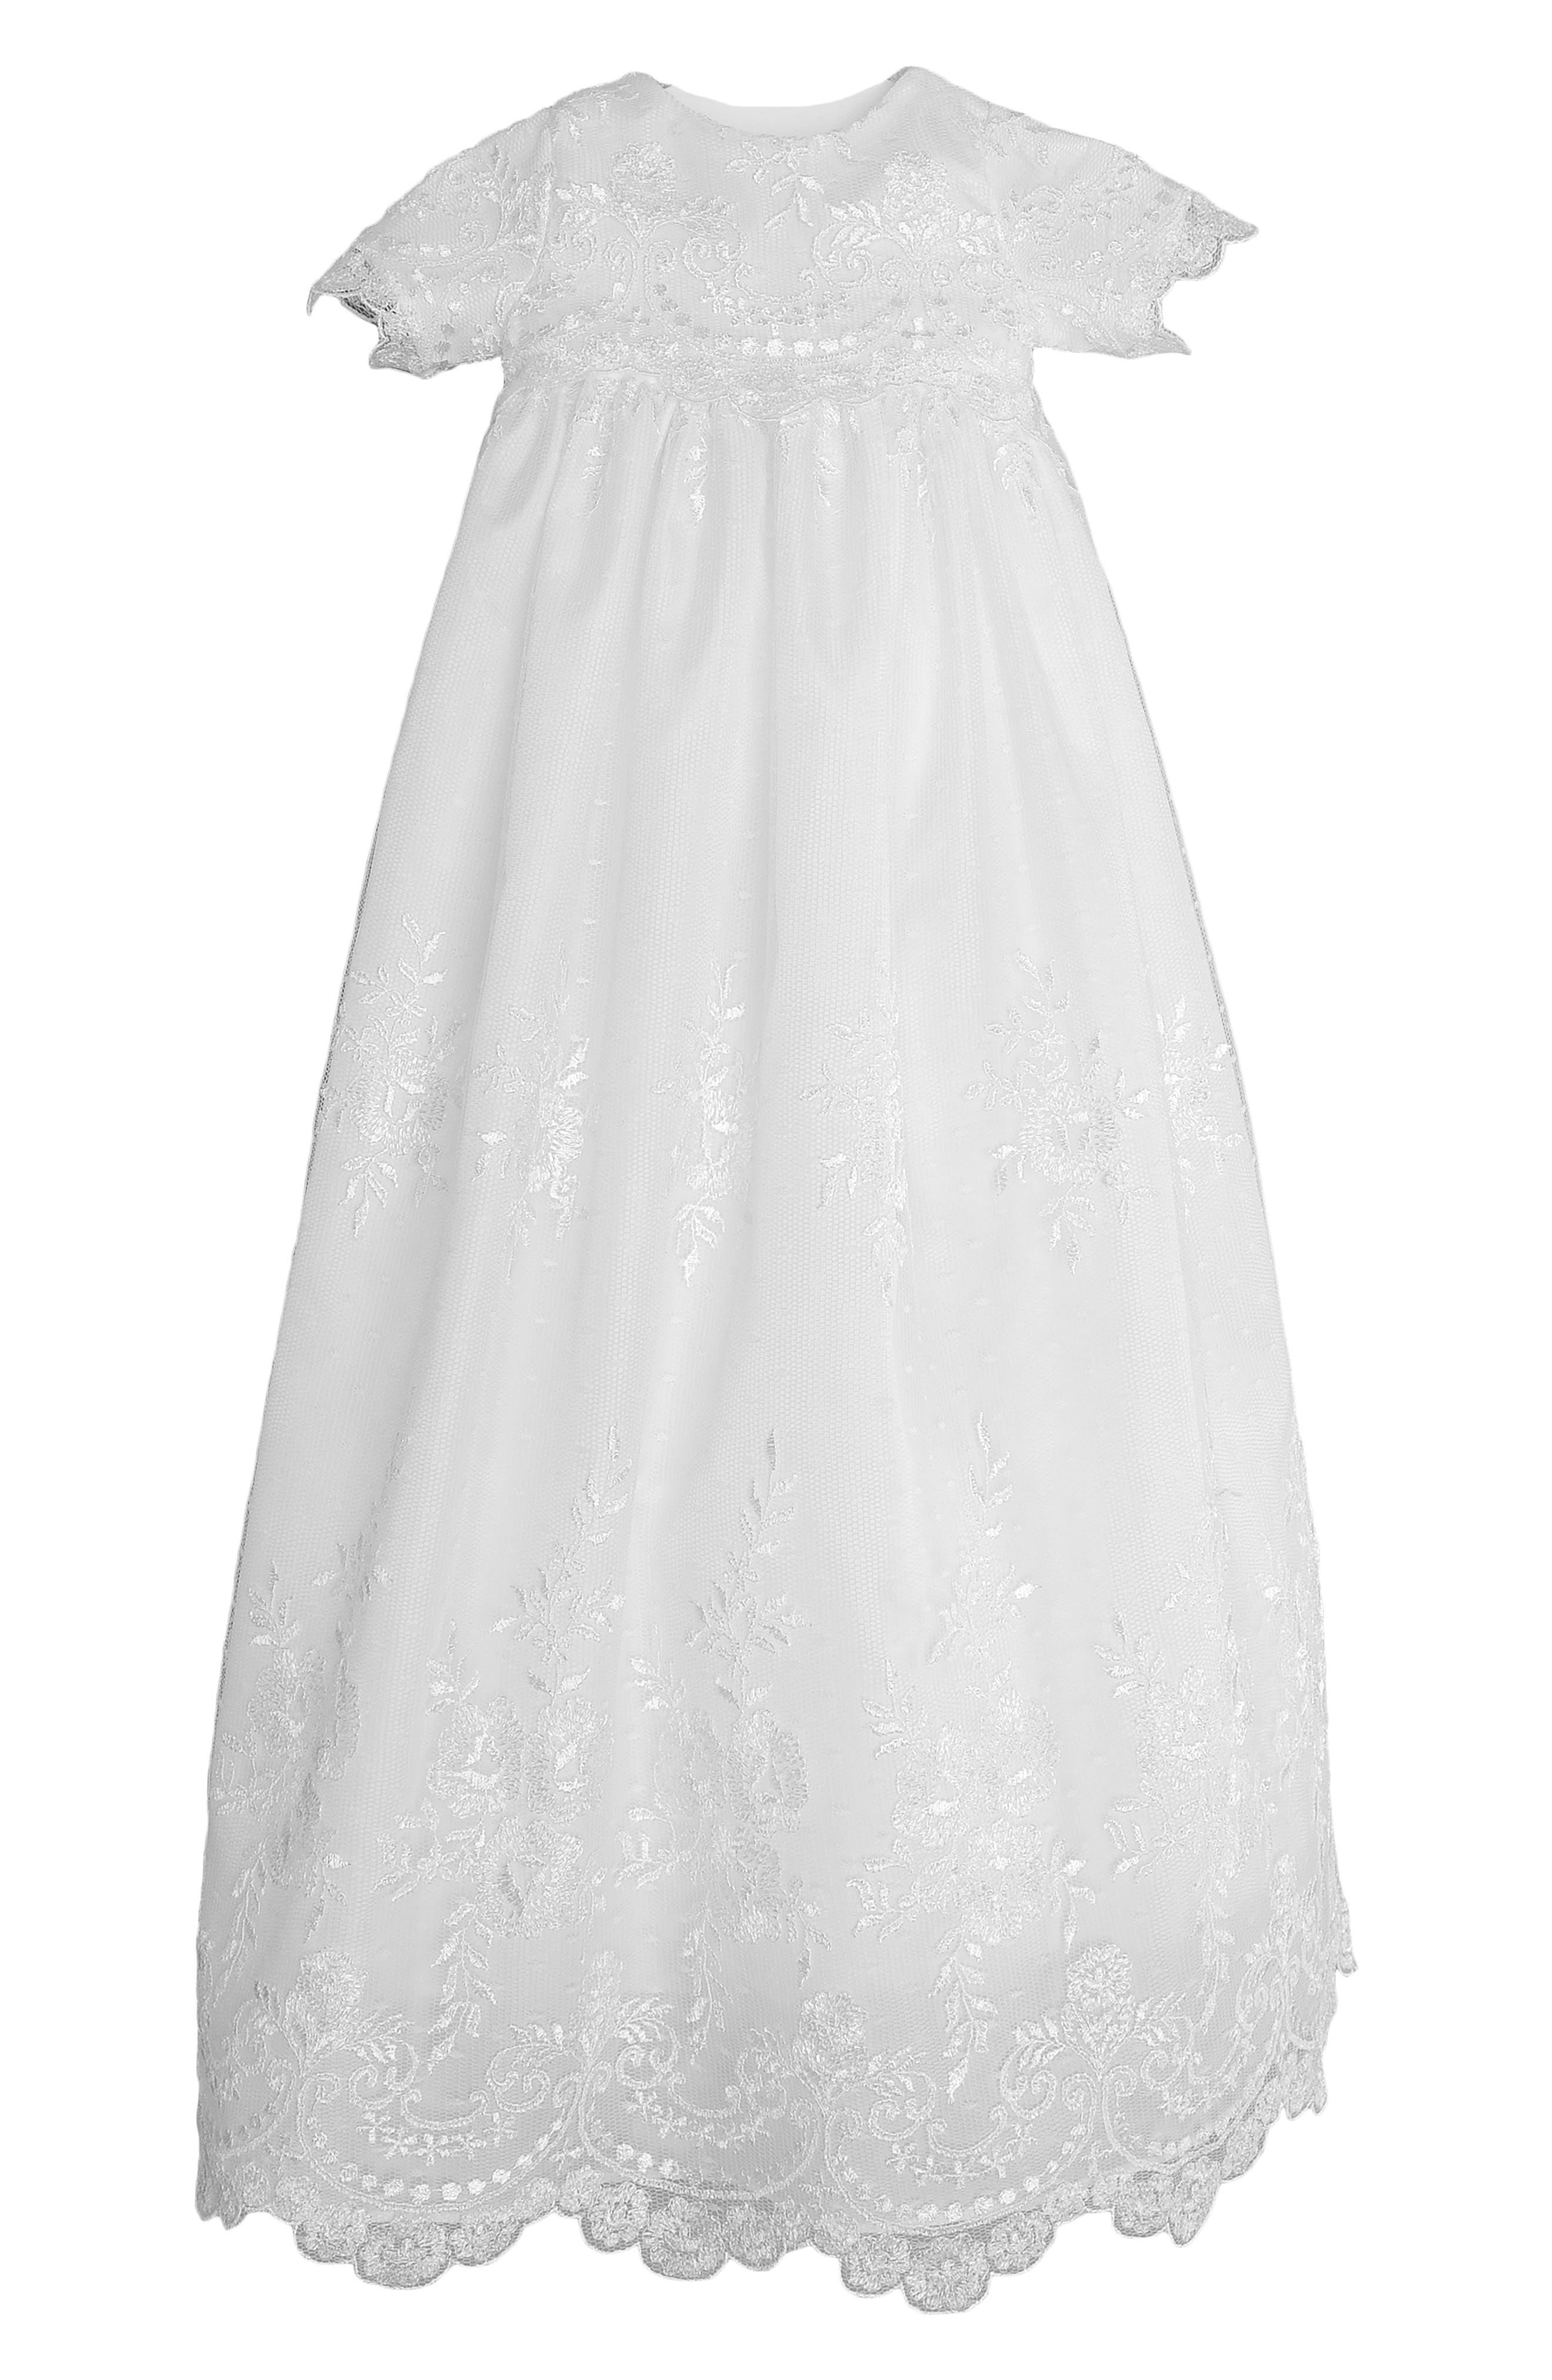 LITTLE THINGS MEAN A LOT Christening Gown, Shawl, Slip & Bonnet Set, Main, color, WHITE